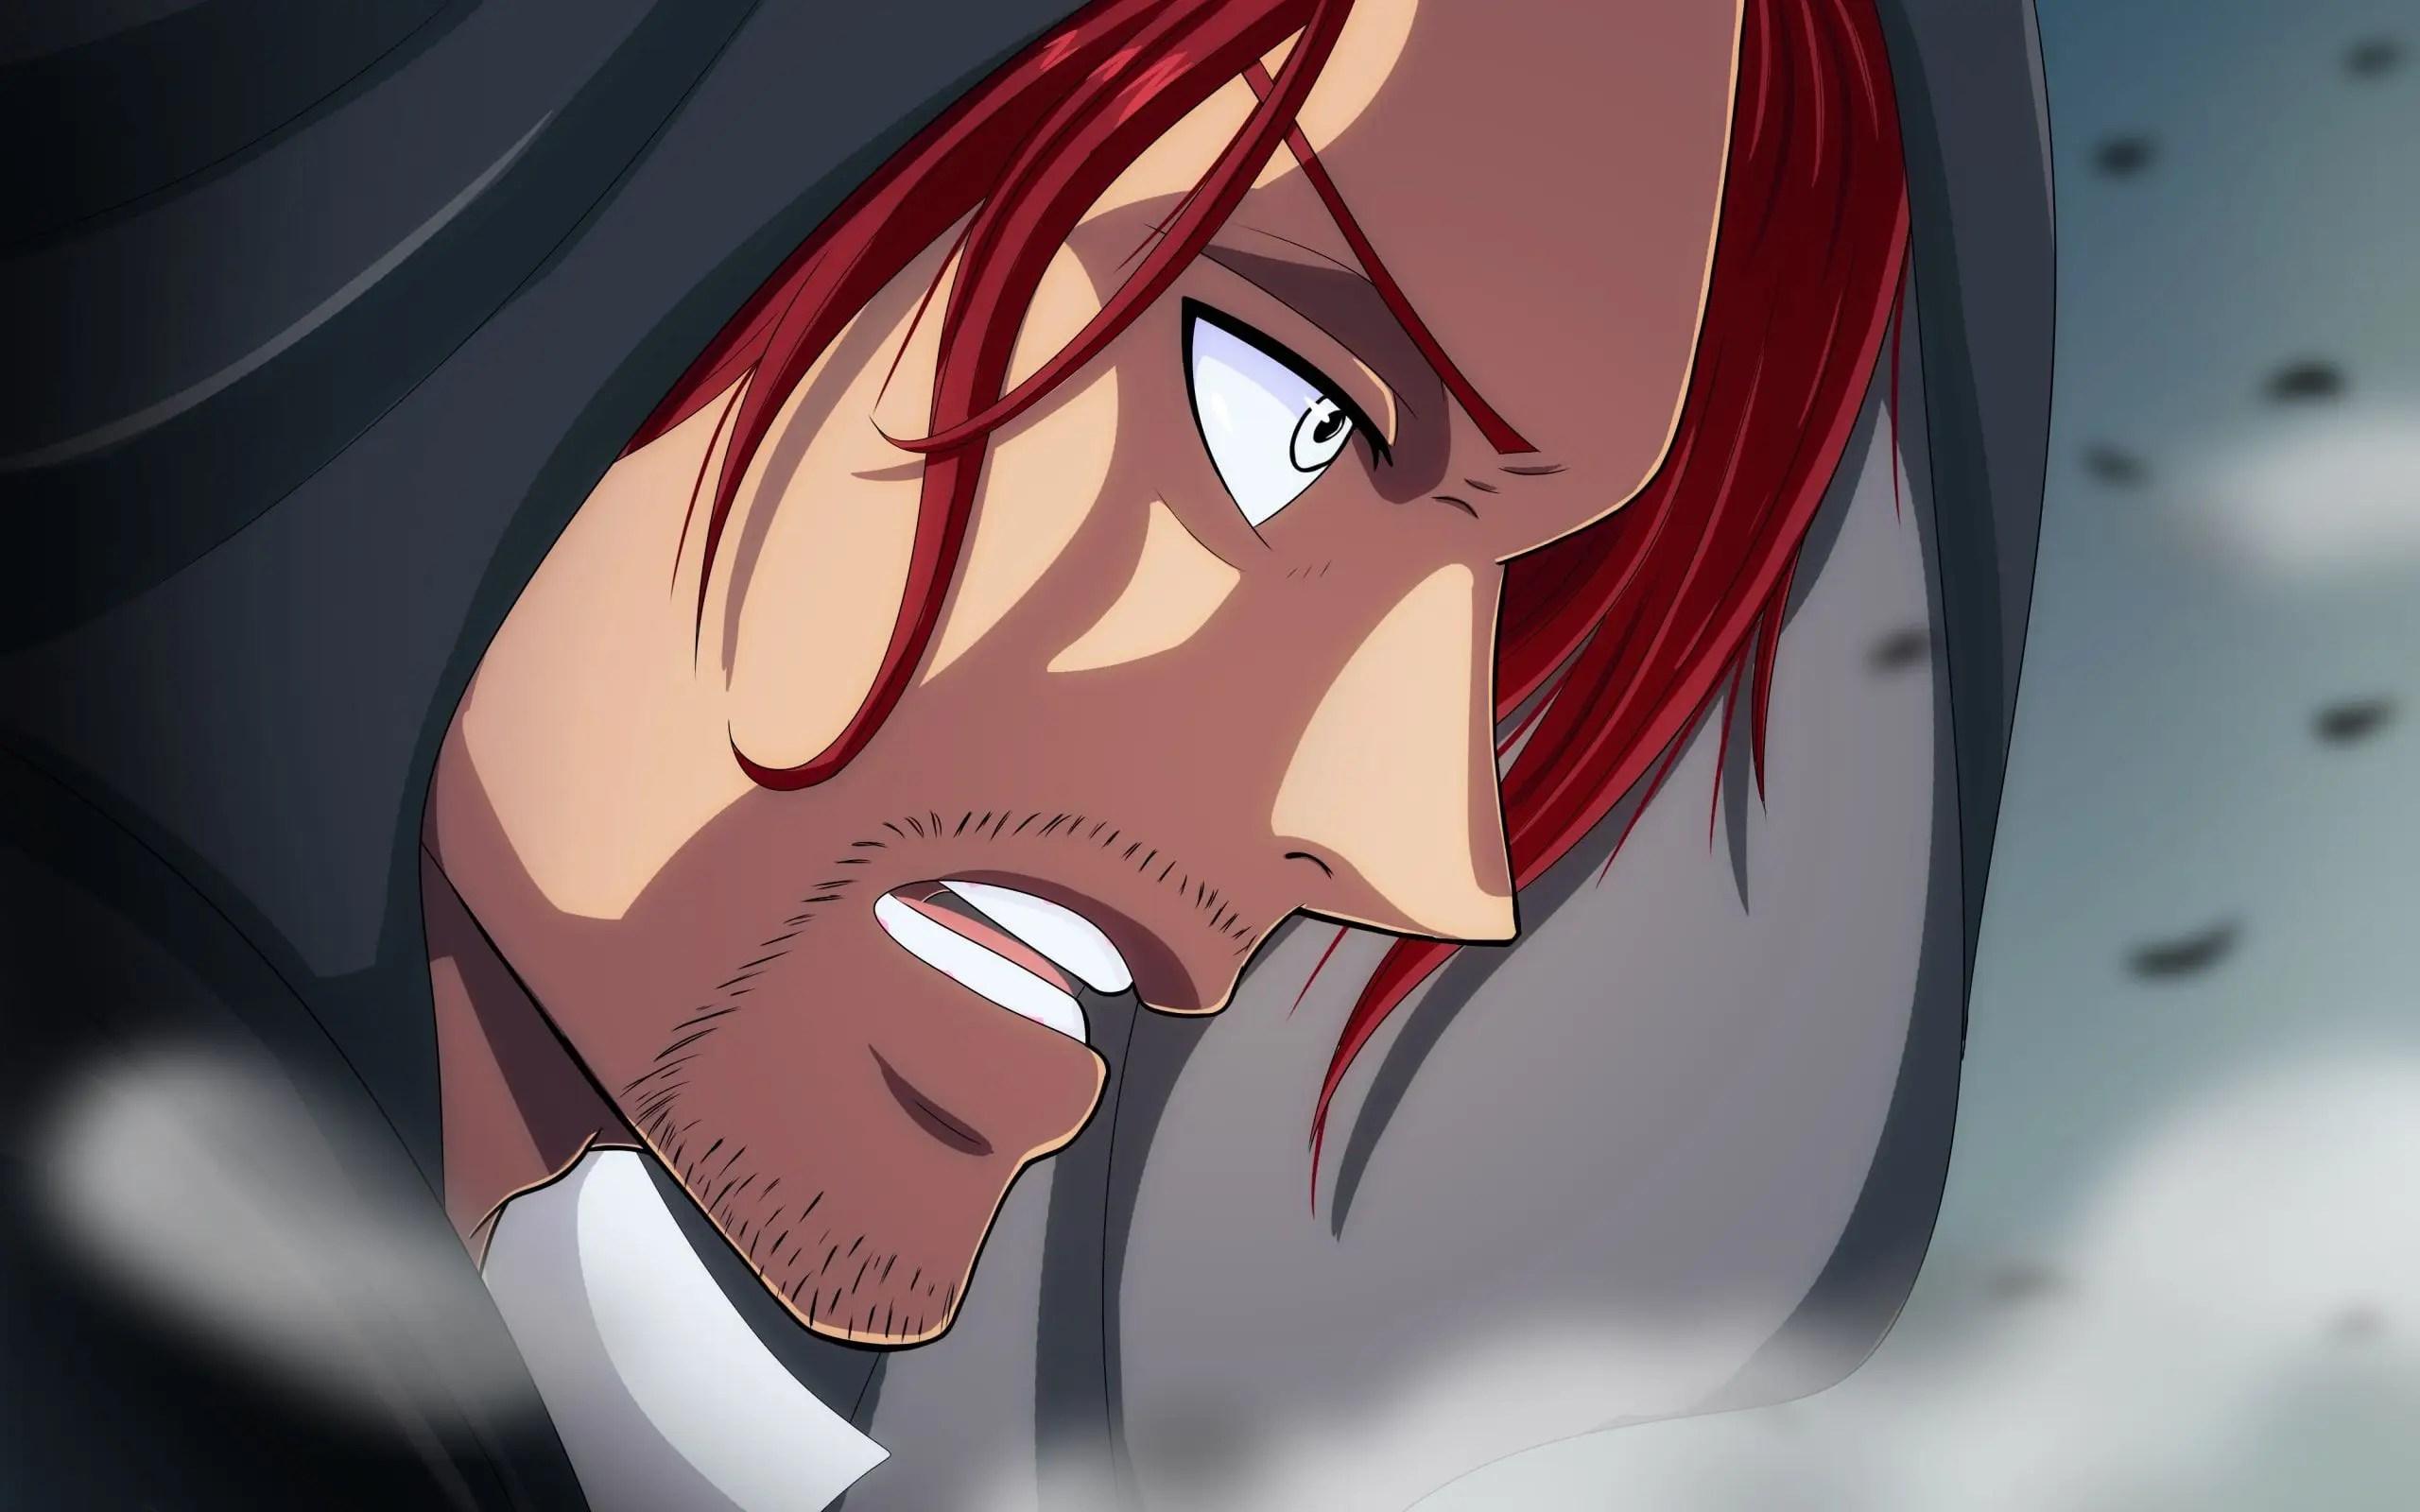 One Piece Chapitre 984 - Date de sortie retardée ! - BLOW